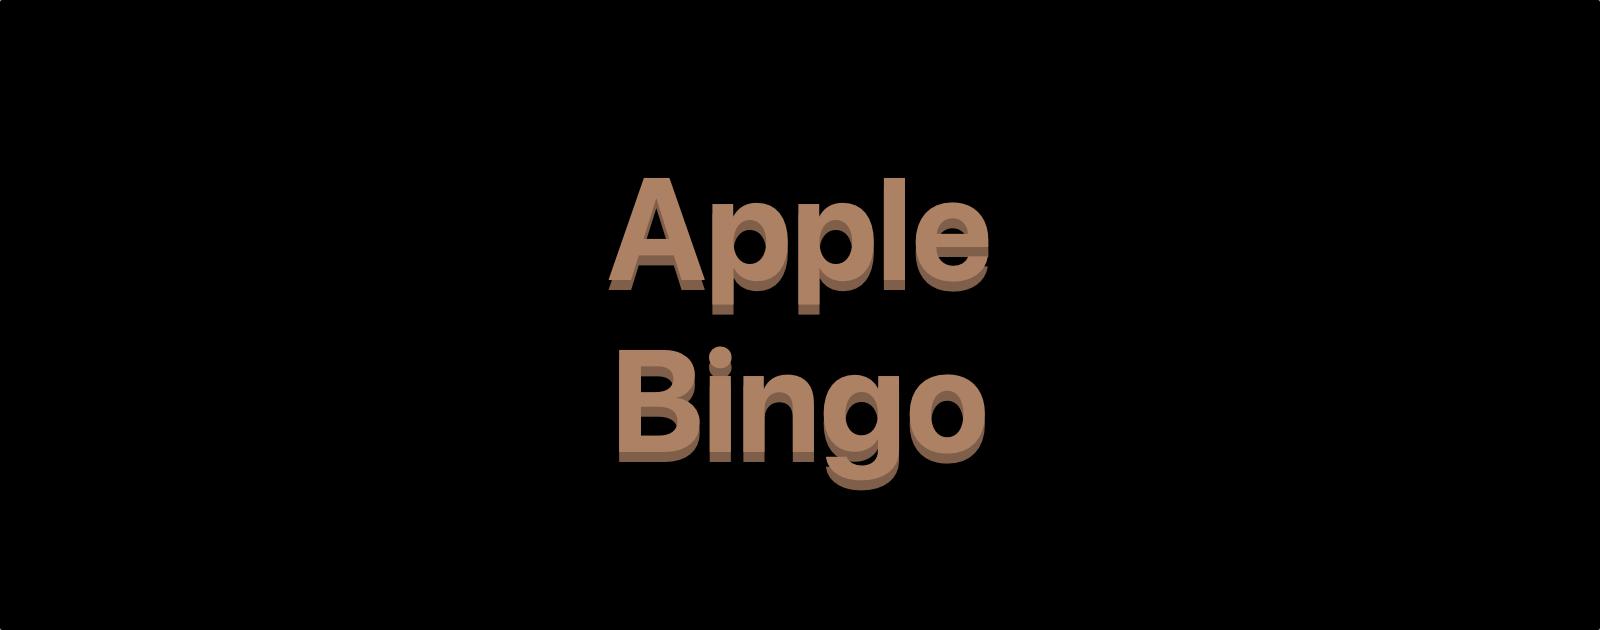 The 2018 Apple Bingo Edition Is Here